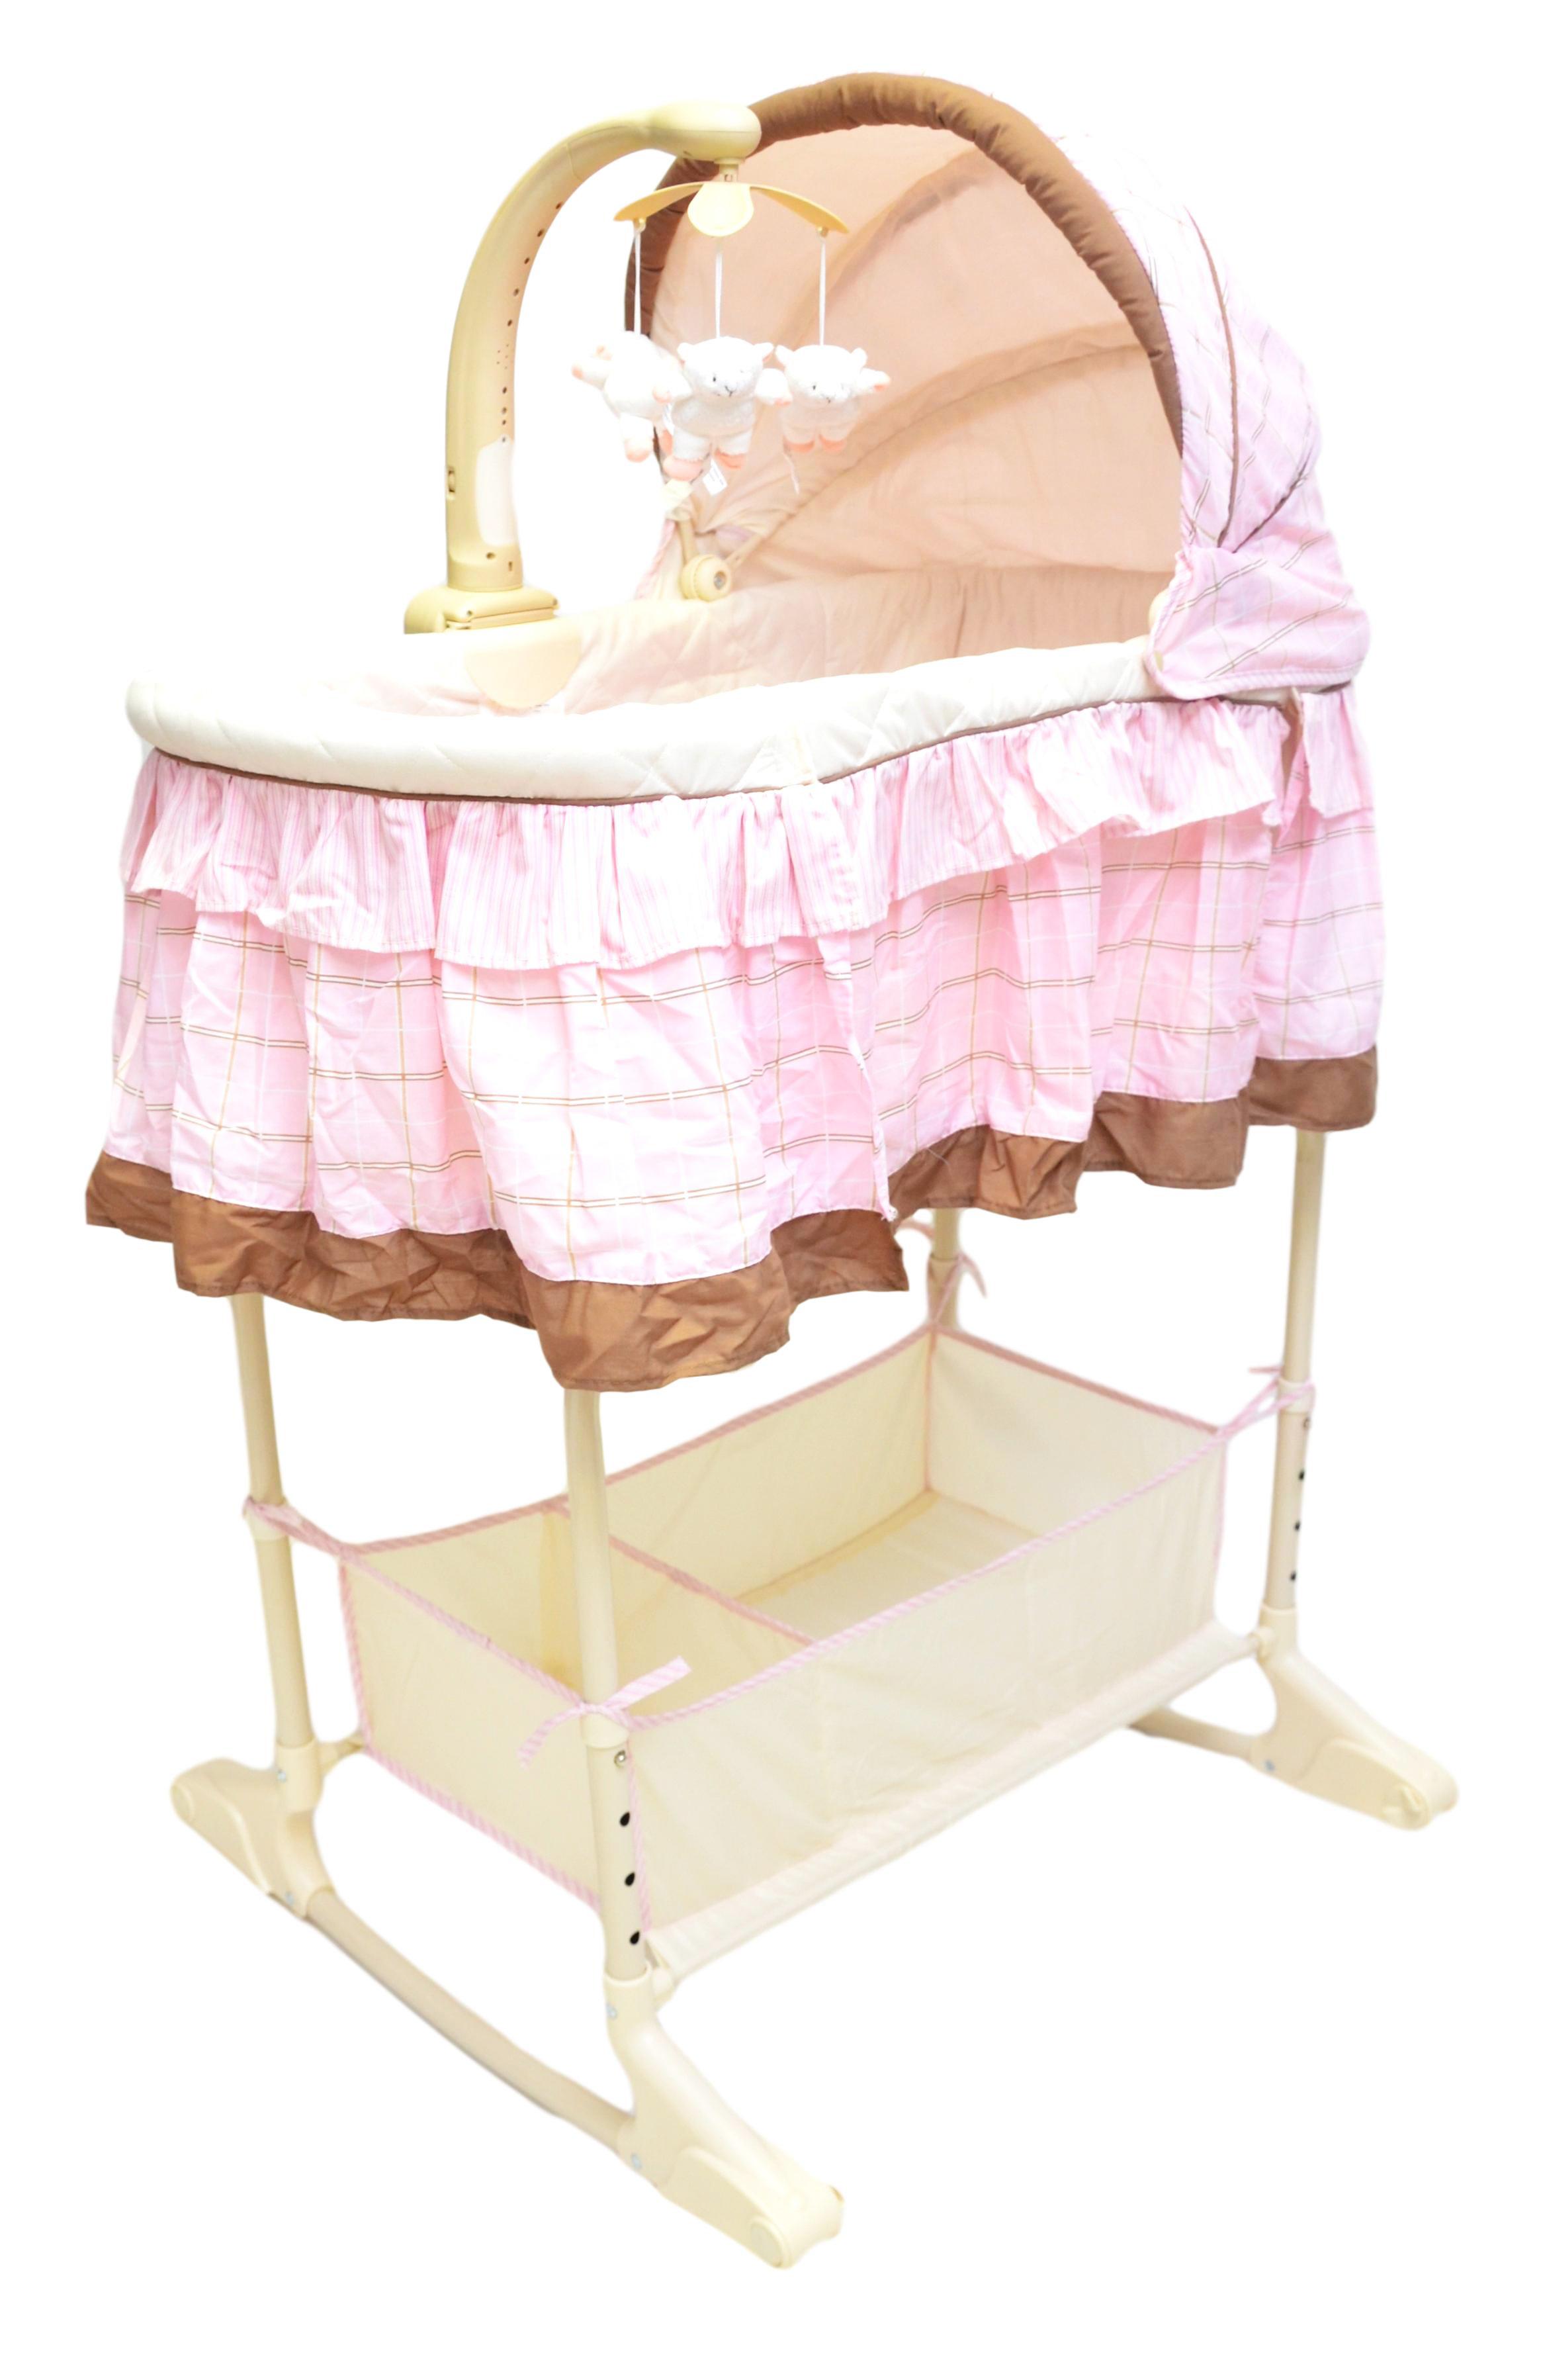 best for kids stubenwagen babywiege babybett babyschaukel stubenbett rosa ebay. Black Bedroom Furniture Sets. Home Design Ideas